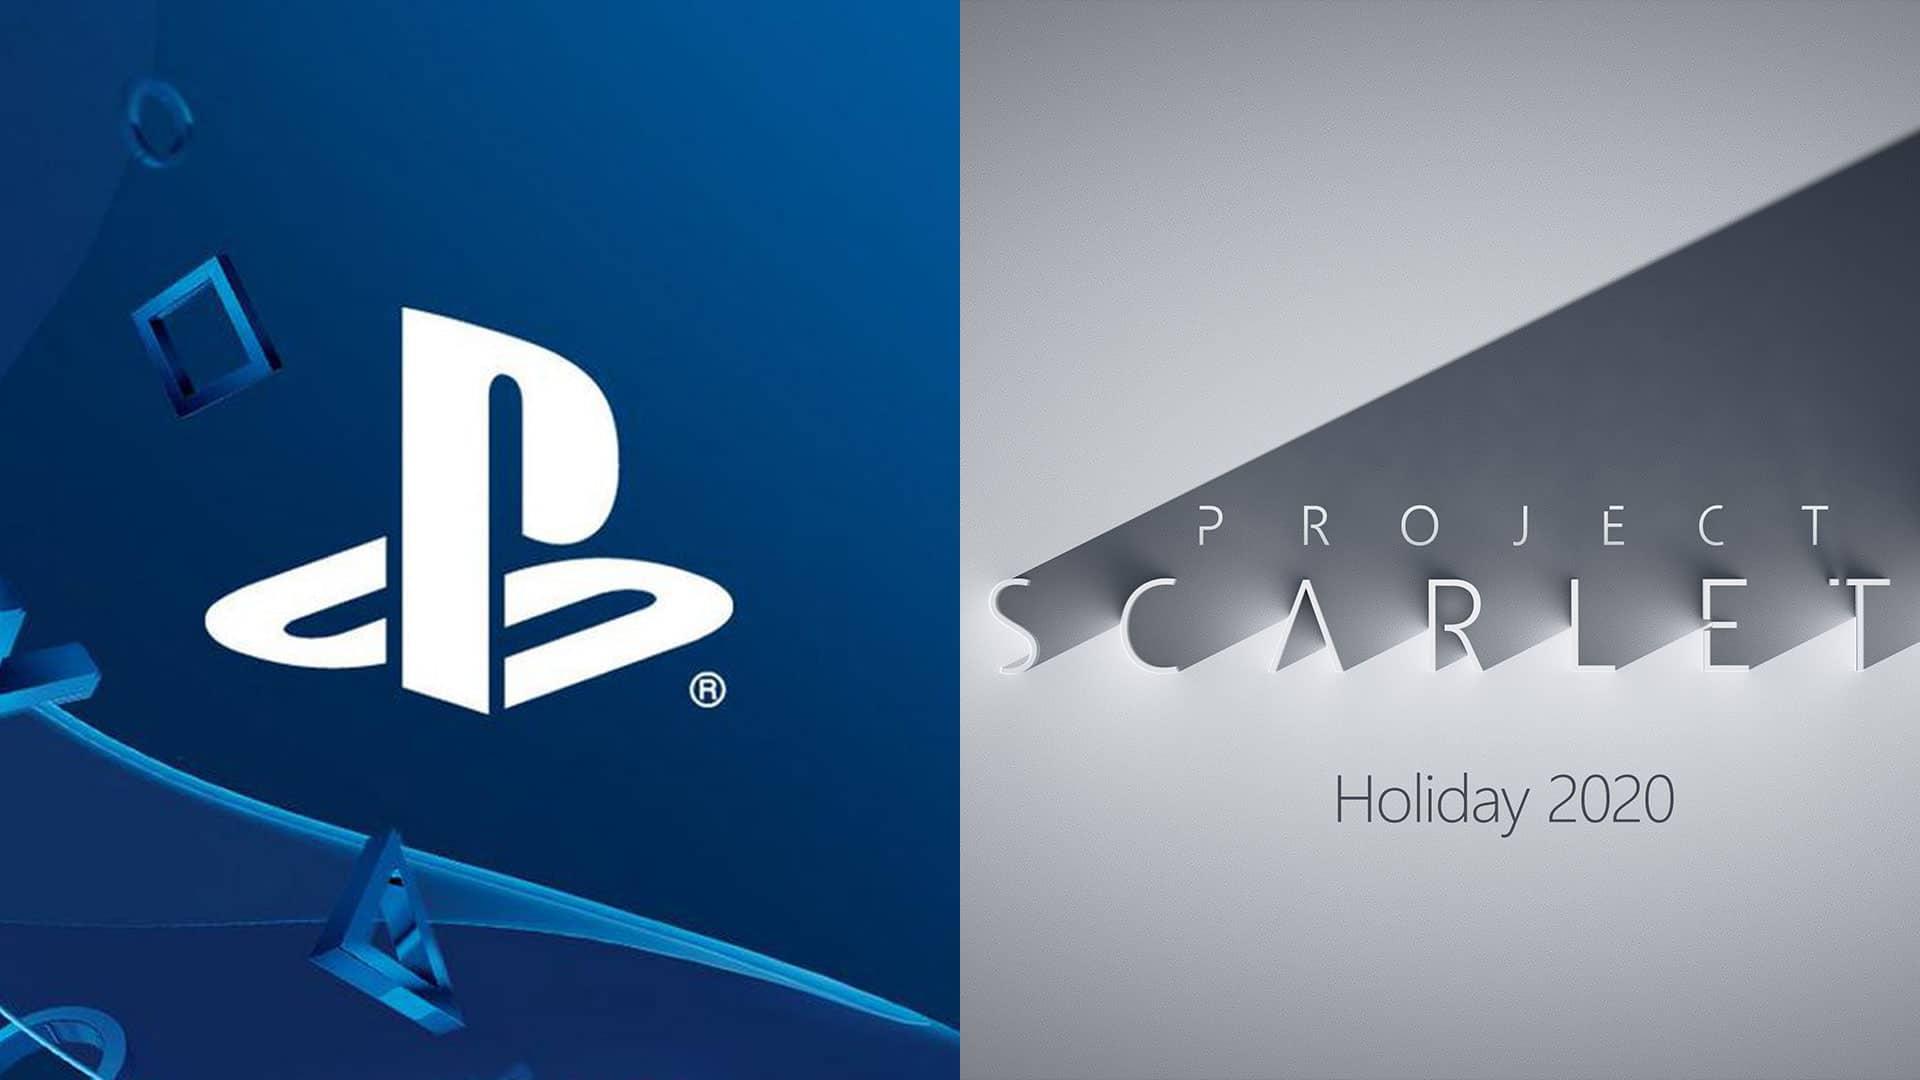 PS5 PlayStation 5 Xbox Scarlet Microsoft Sony next-gen